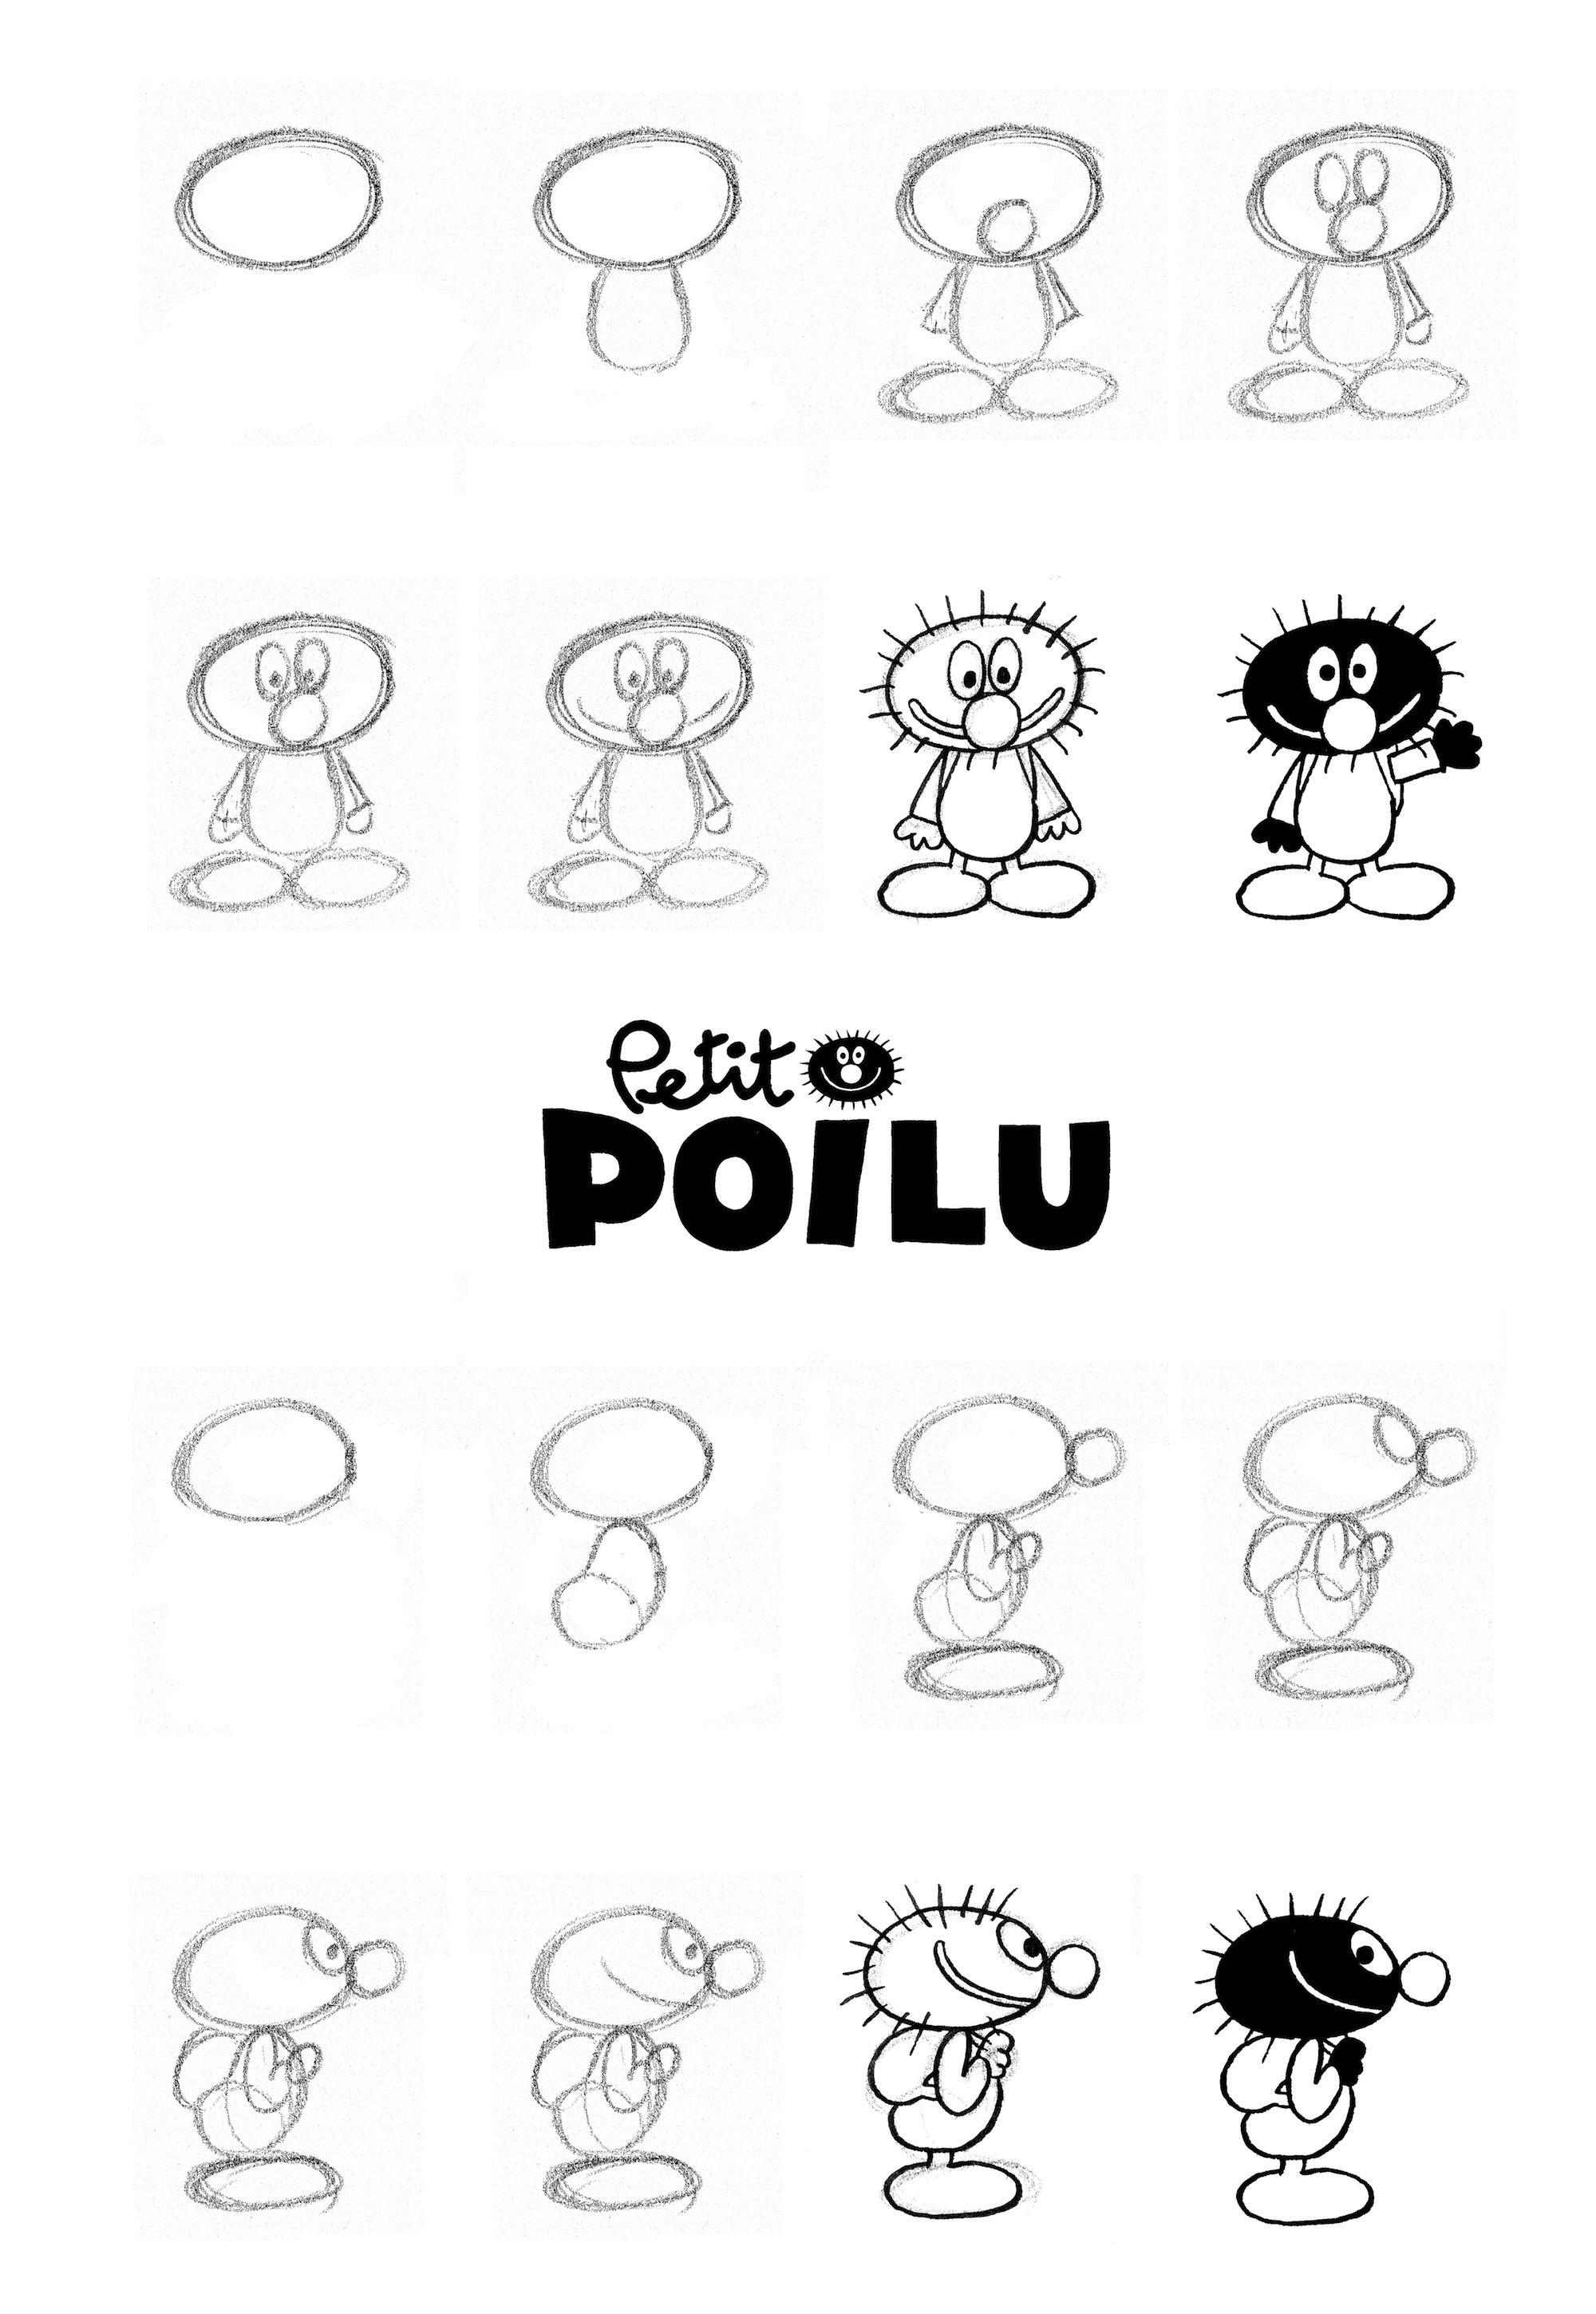 Dessiner petit poilu for kids pinterest petit poilu - Dessin de poilu ...